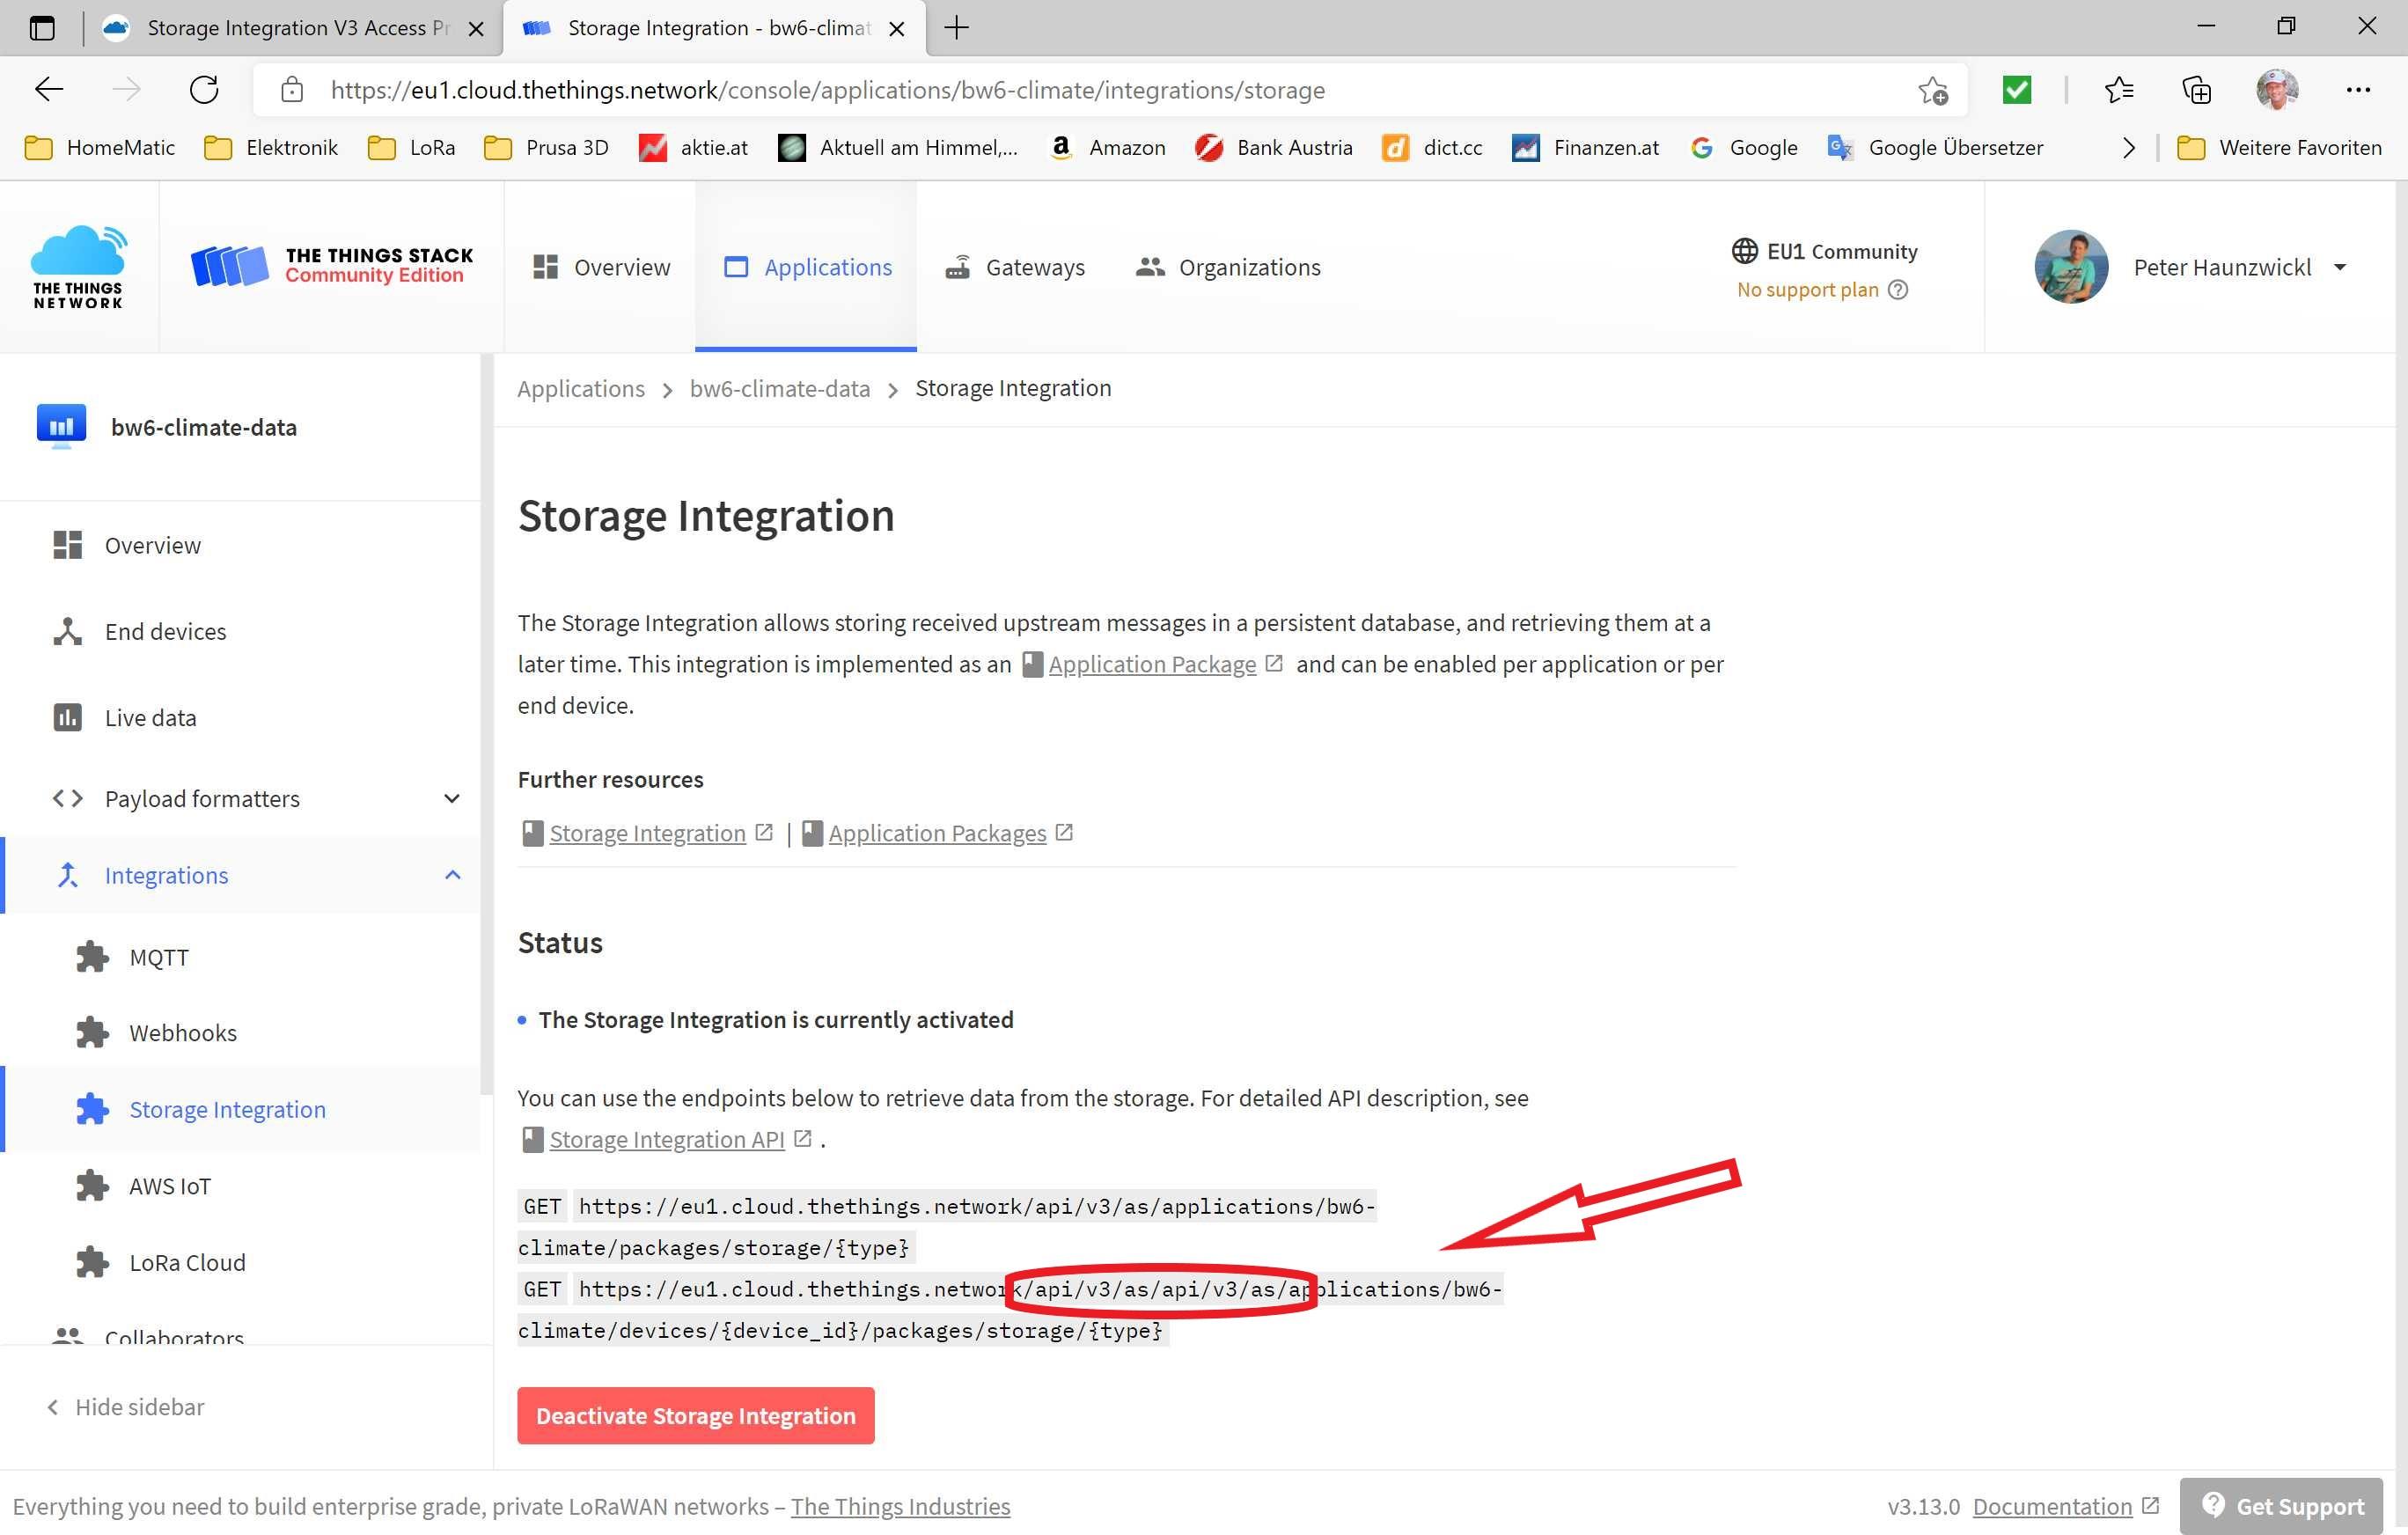 Storage Integration